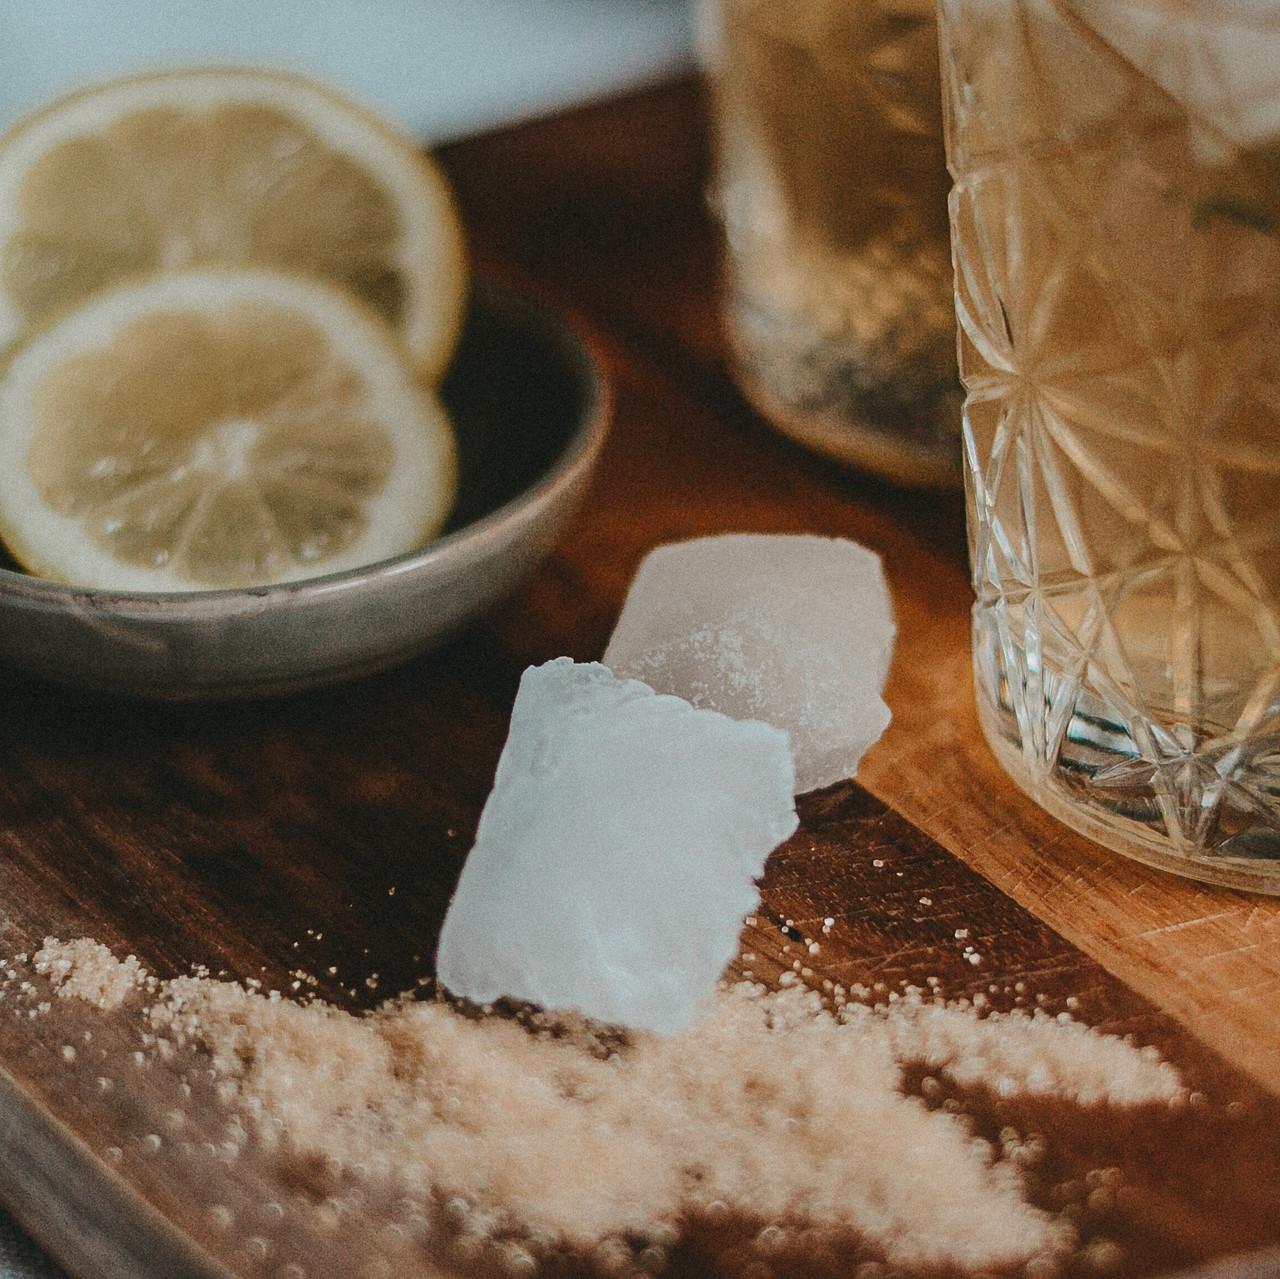 Selfmade Eistee ohne Zucker